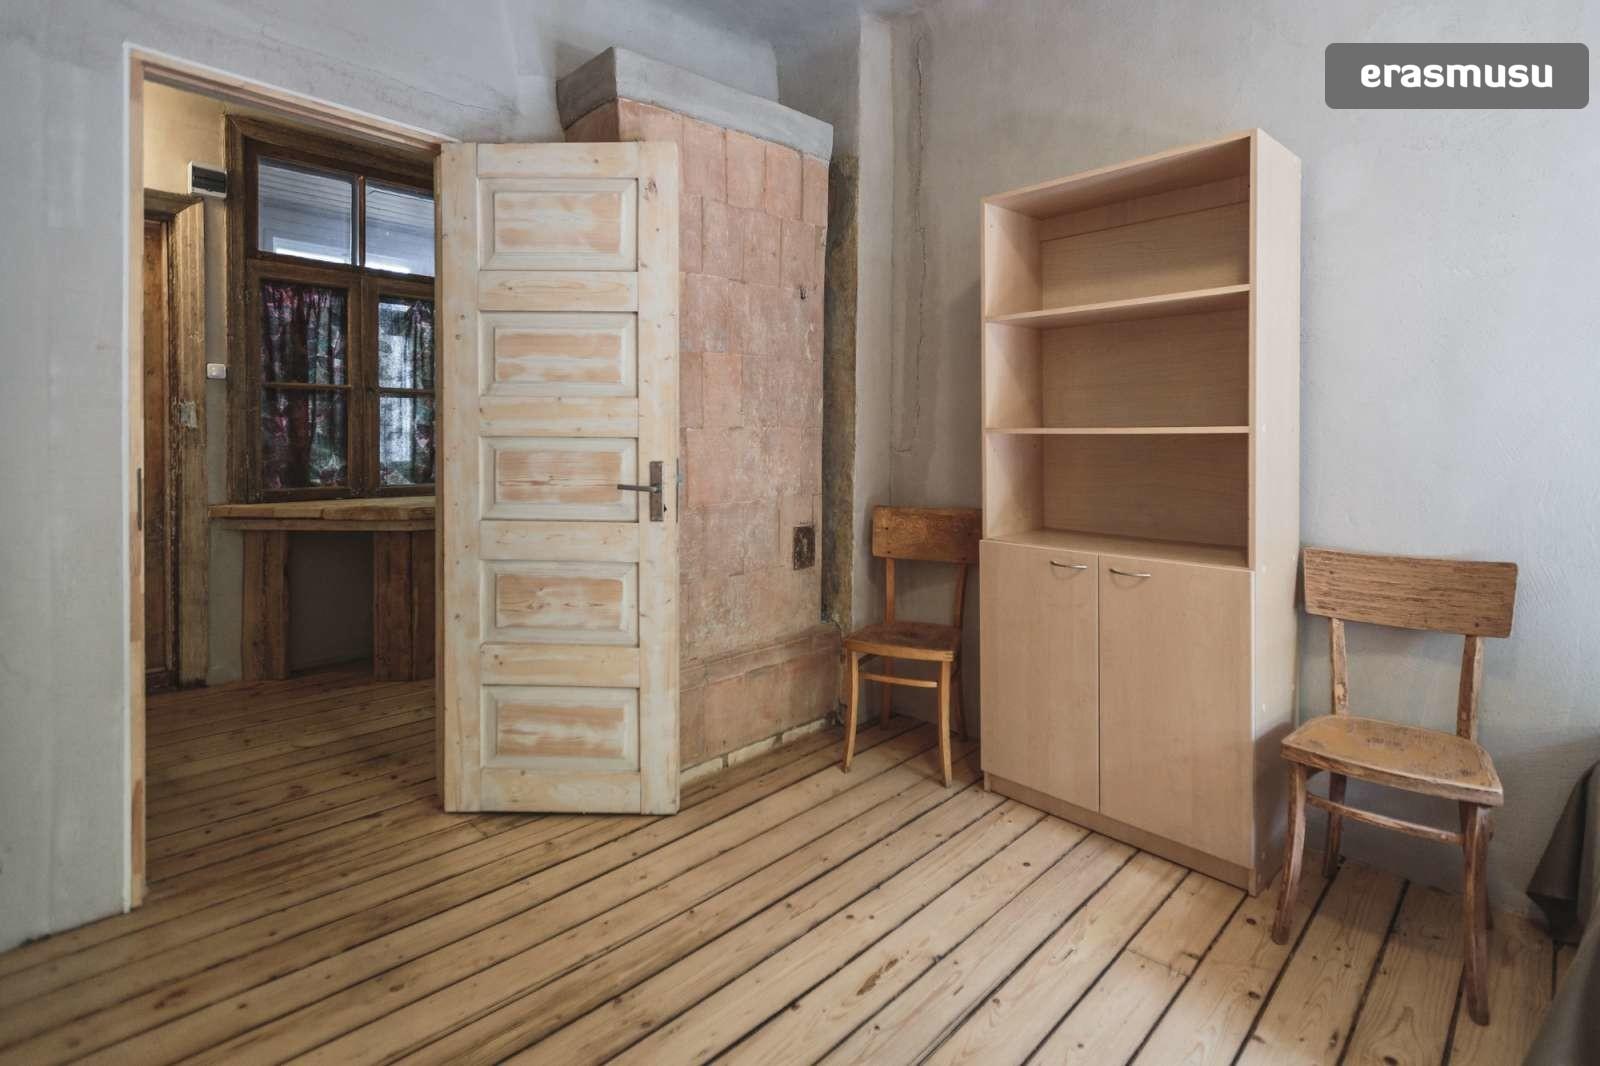 charming-studio-apartment-rent-agenskalns-pet-friendly-5c4d54504